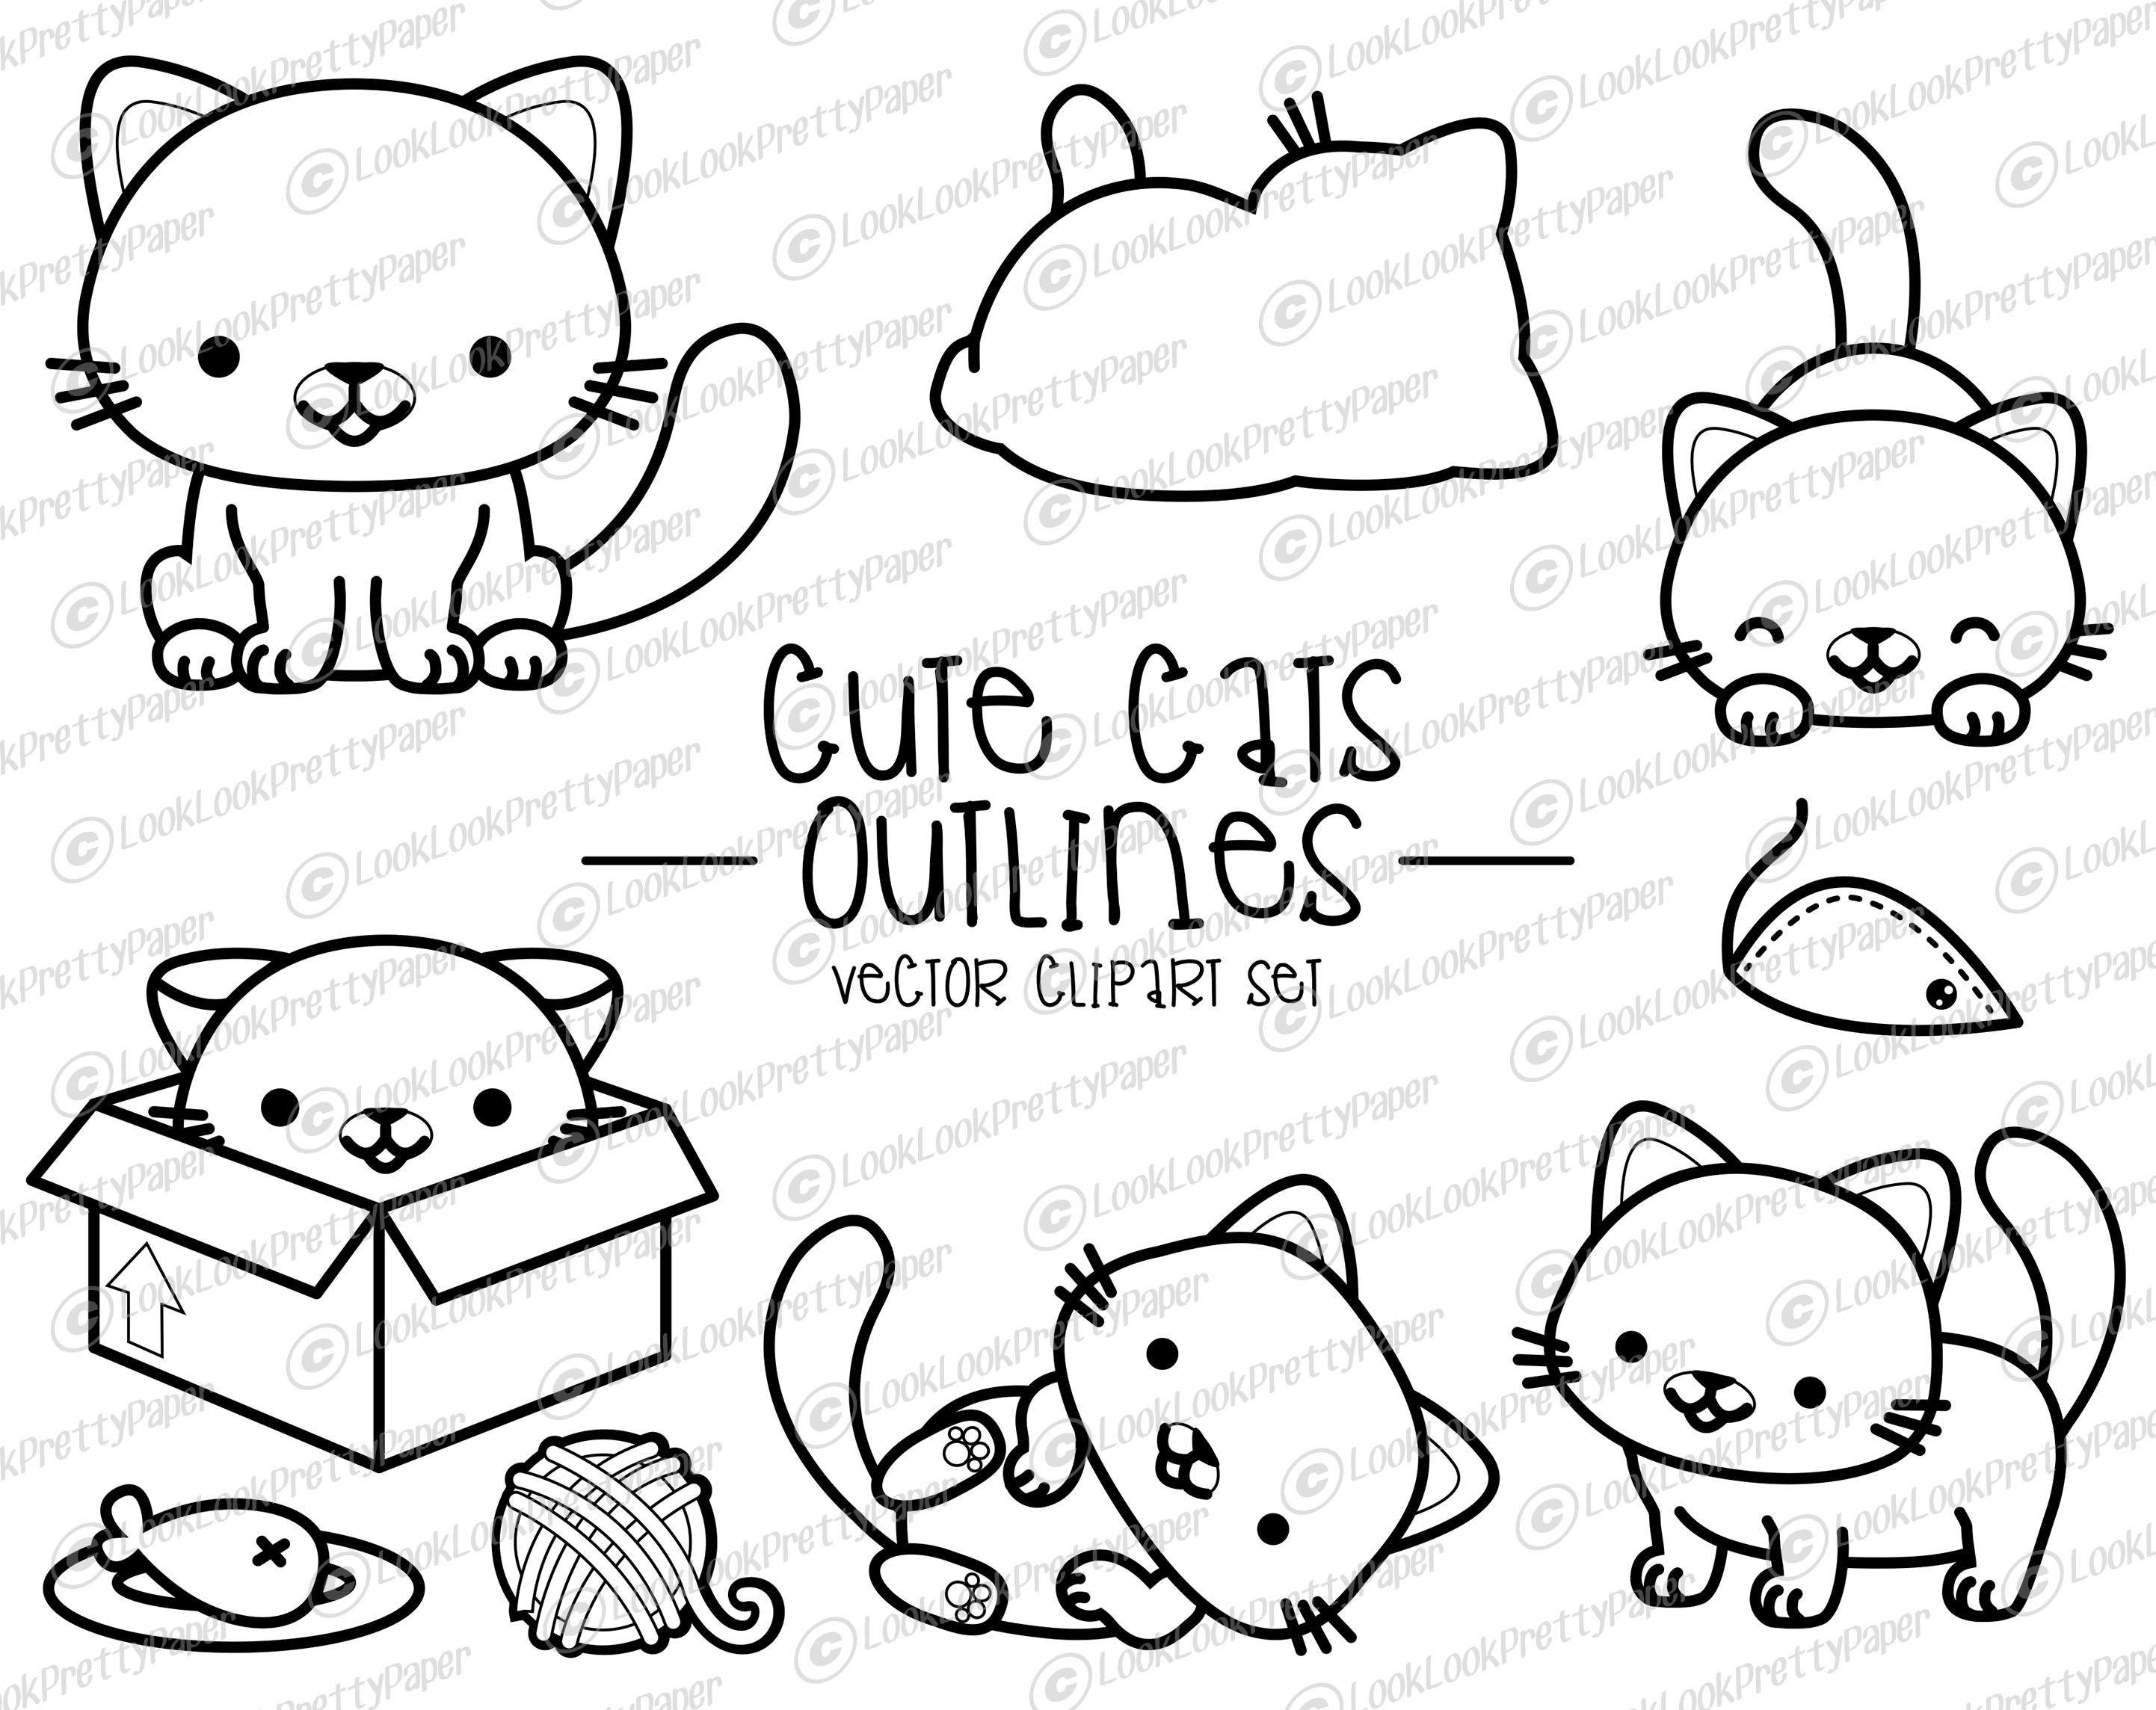 Premium Vector Clipart Kawaii Cat Outlines Cute Cat Etsy In 2020 Cat Outline Kawaii Cat Kawaii Clipart